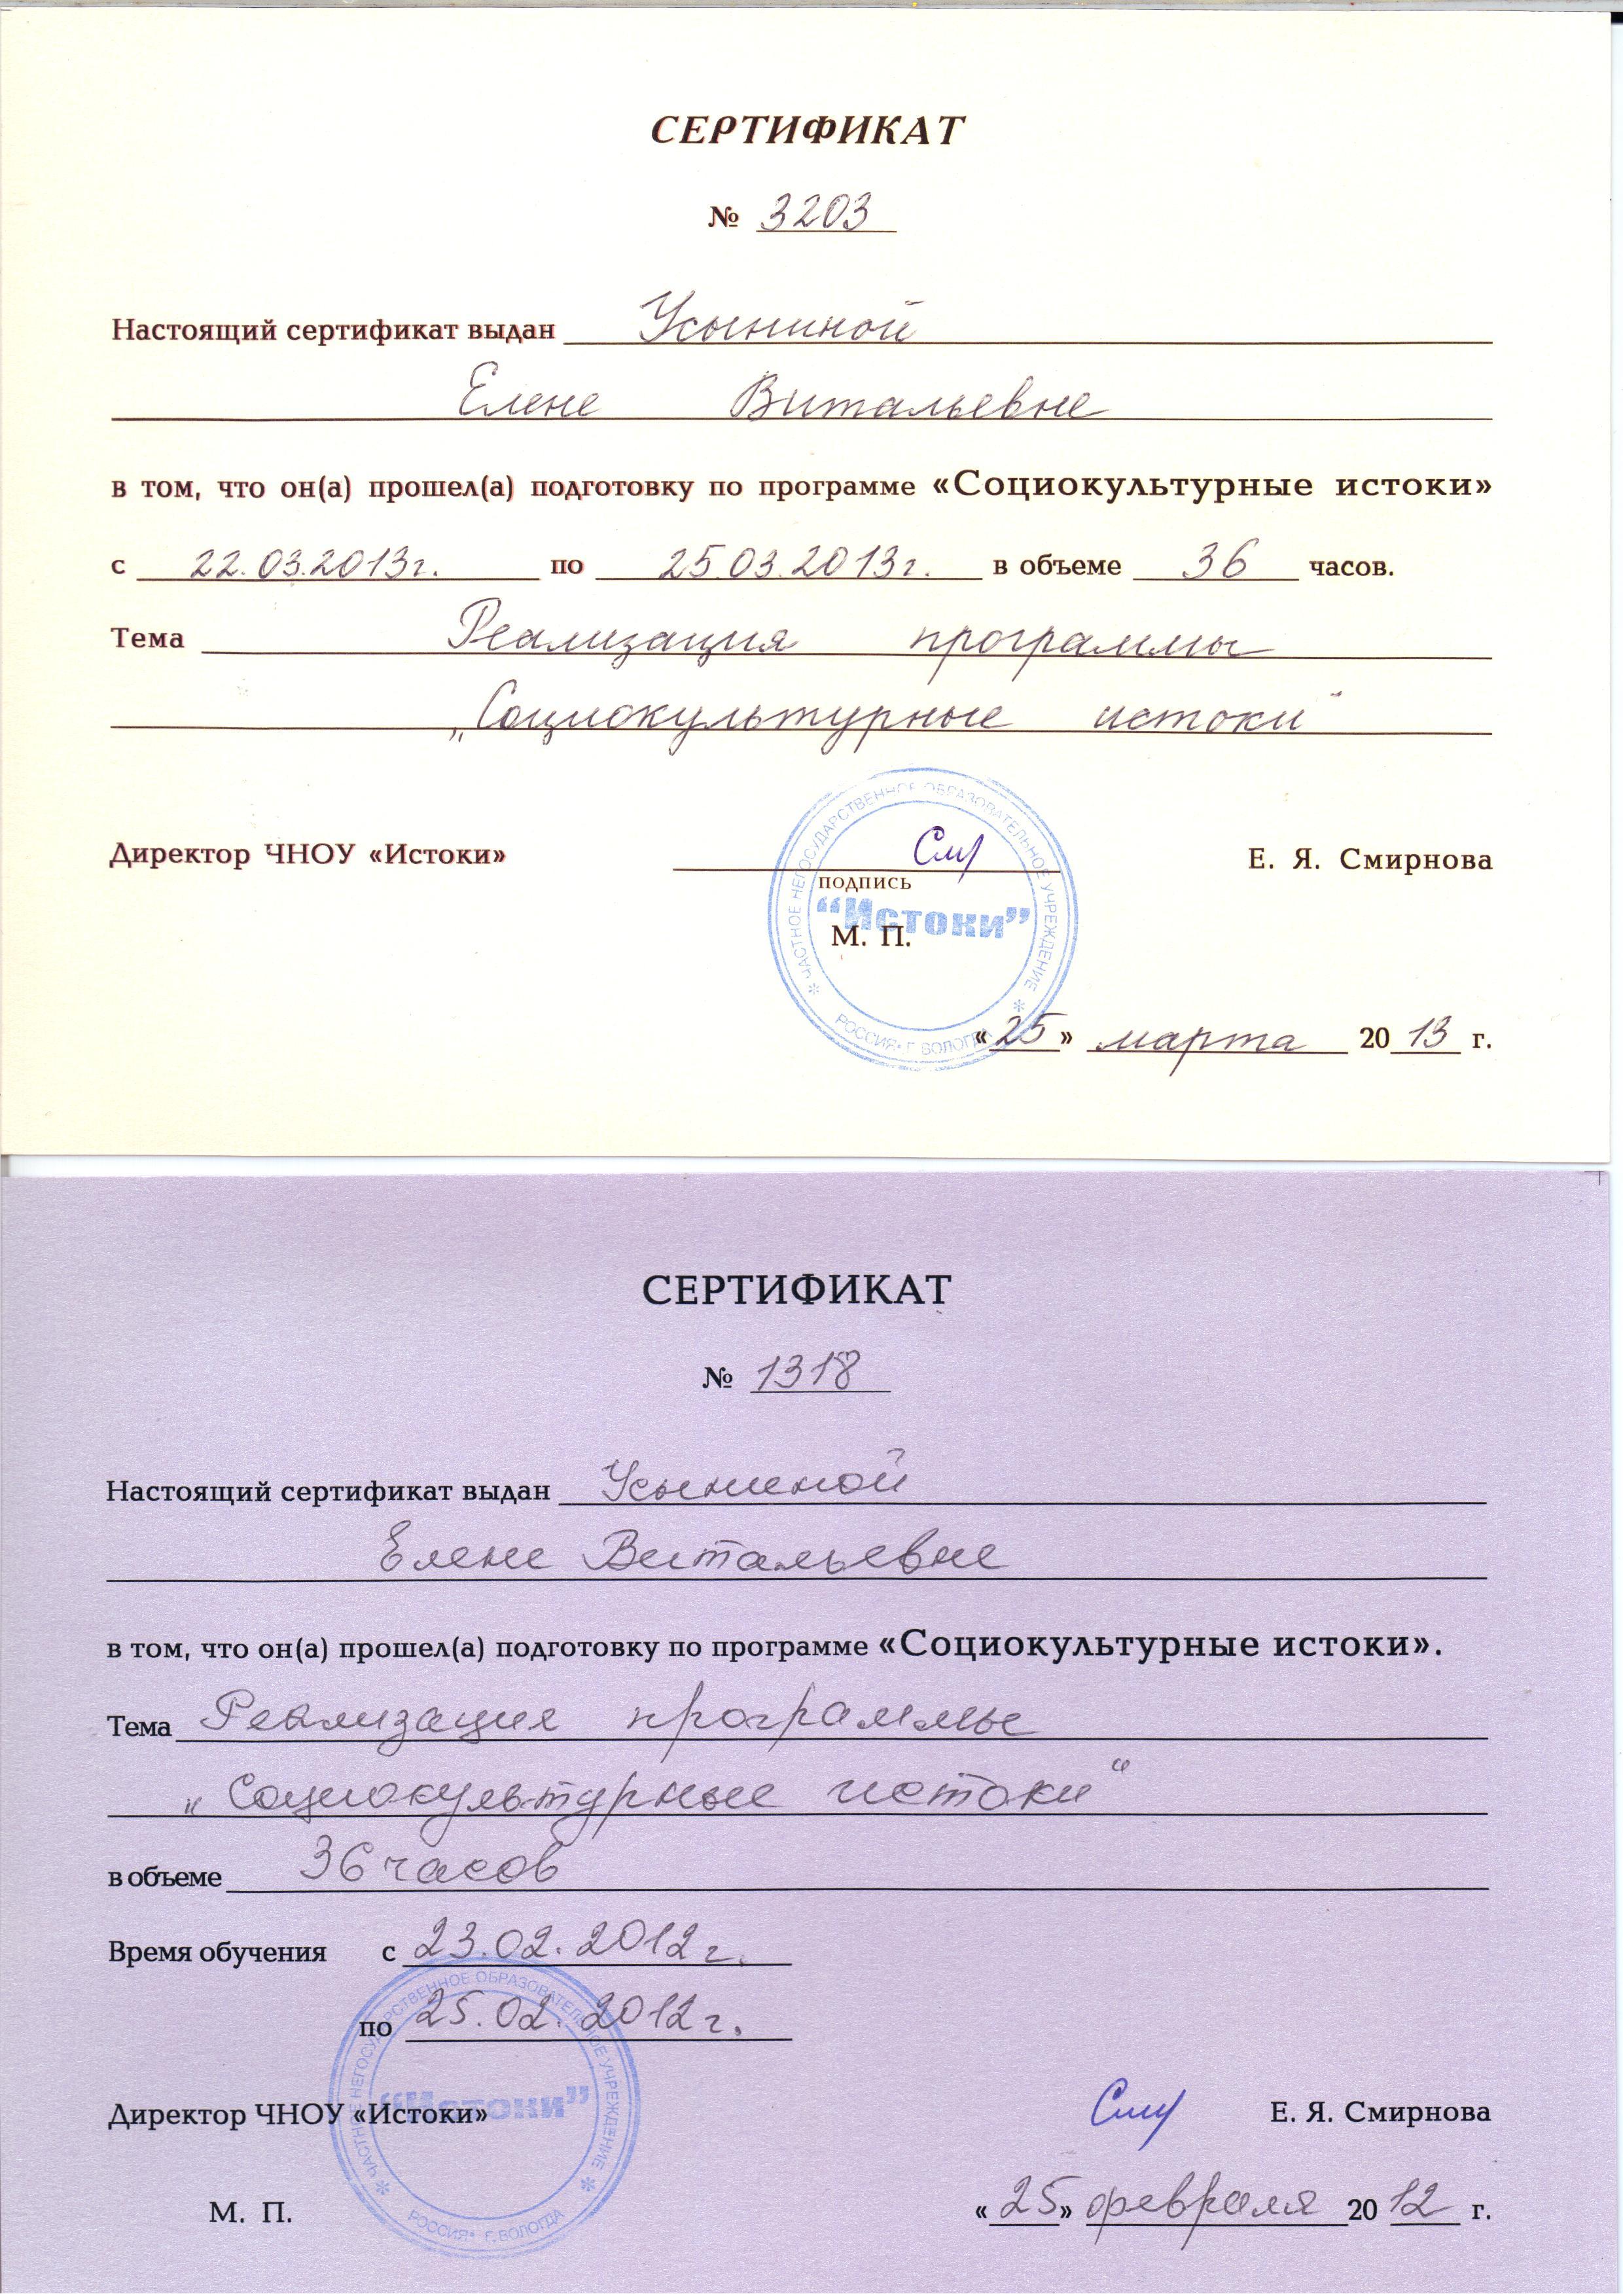 C:\Users\Елена\Documents\Panasonic\MFS\Scan\20141123_210424.jpg